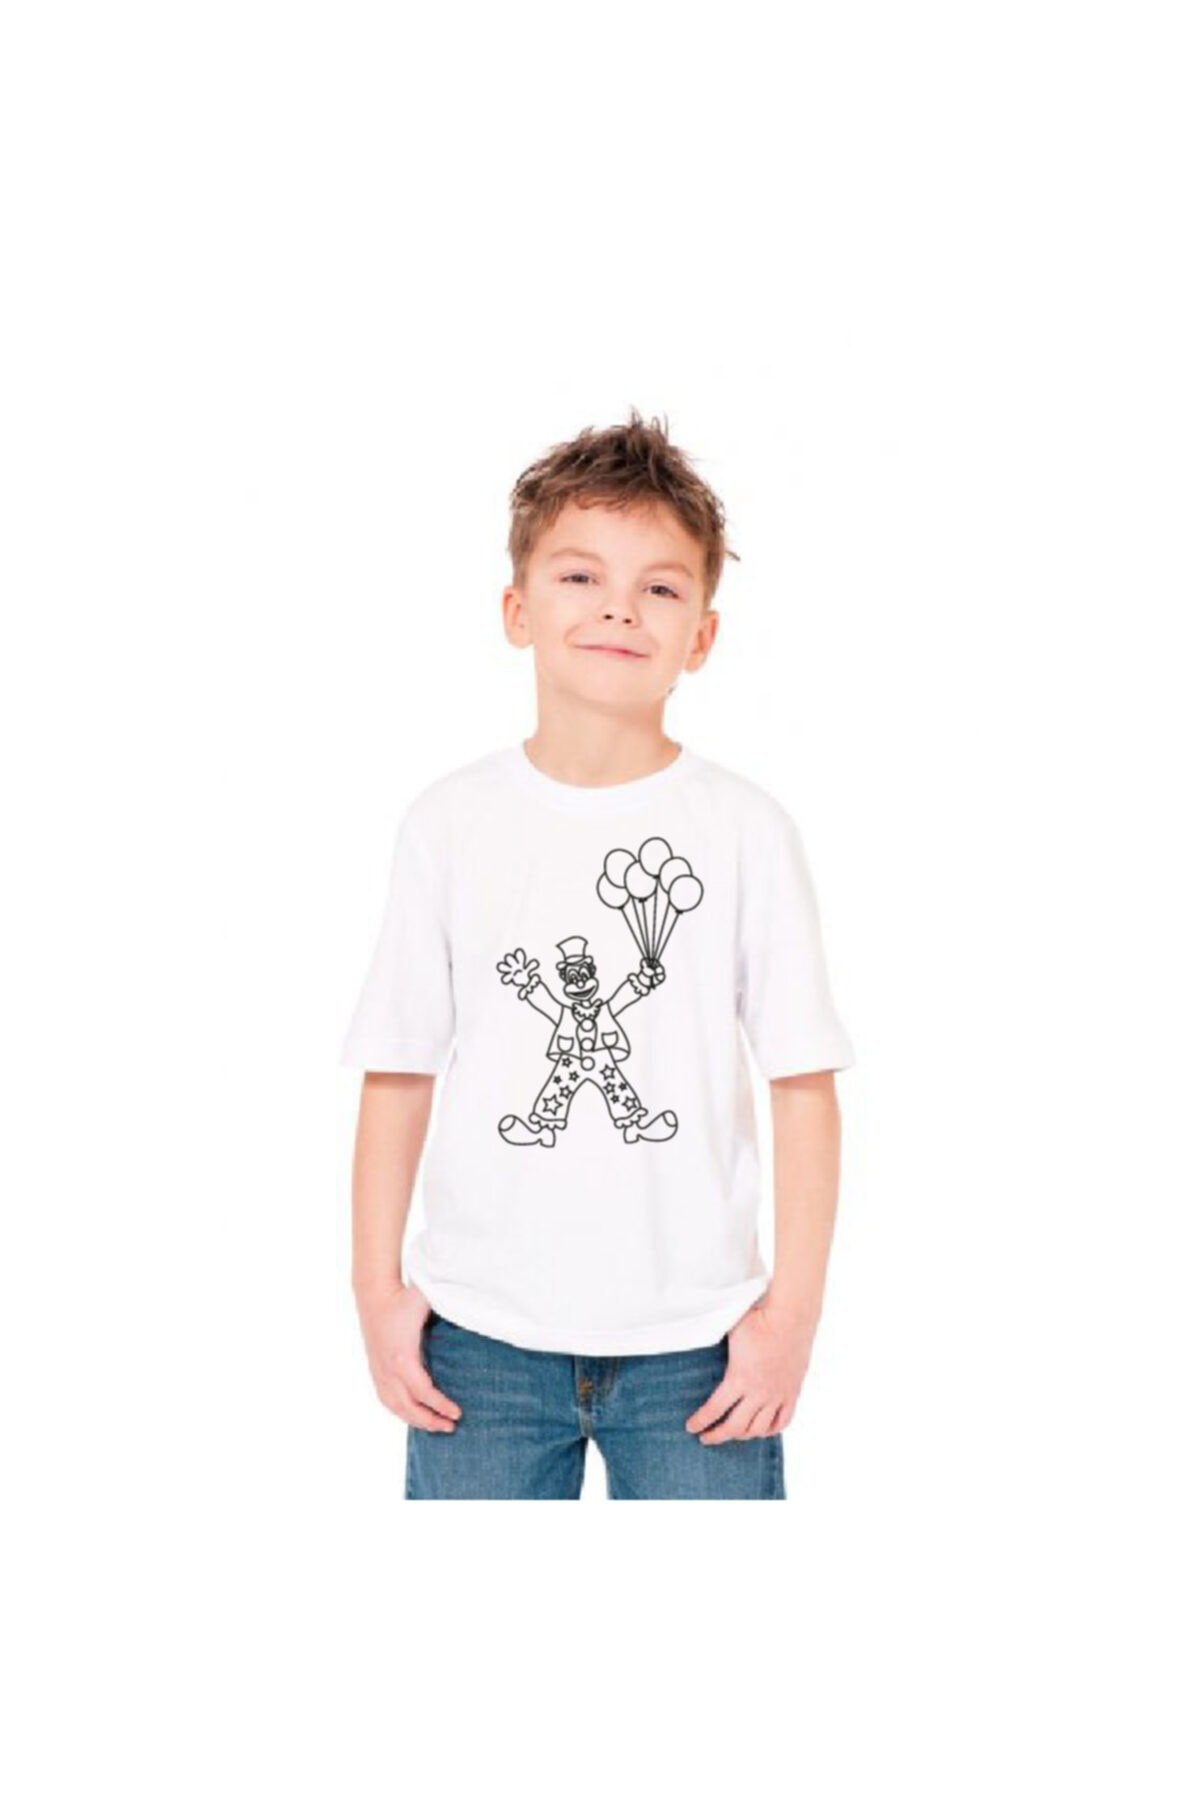 paint-wear Palyaço Boyama T-shirt 4-6 Yaş 2